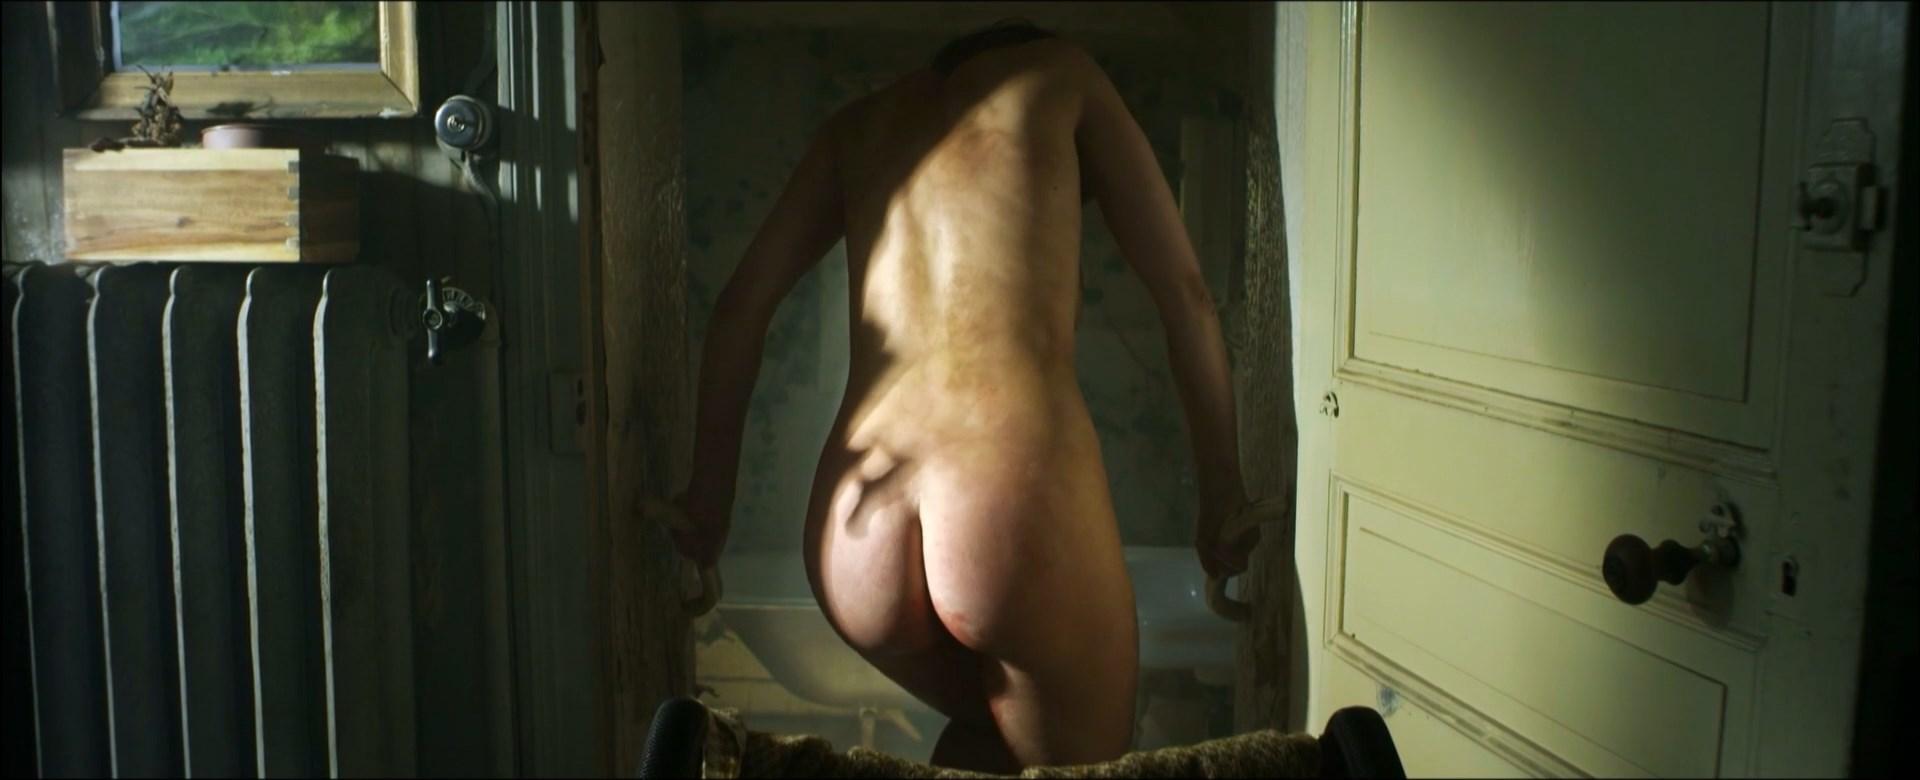 Ana Ayora Nude 2013 » page 6 » celebs nude video - nudecelebvideo